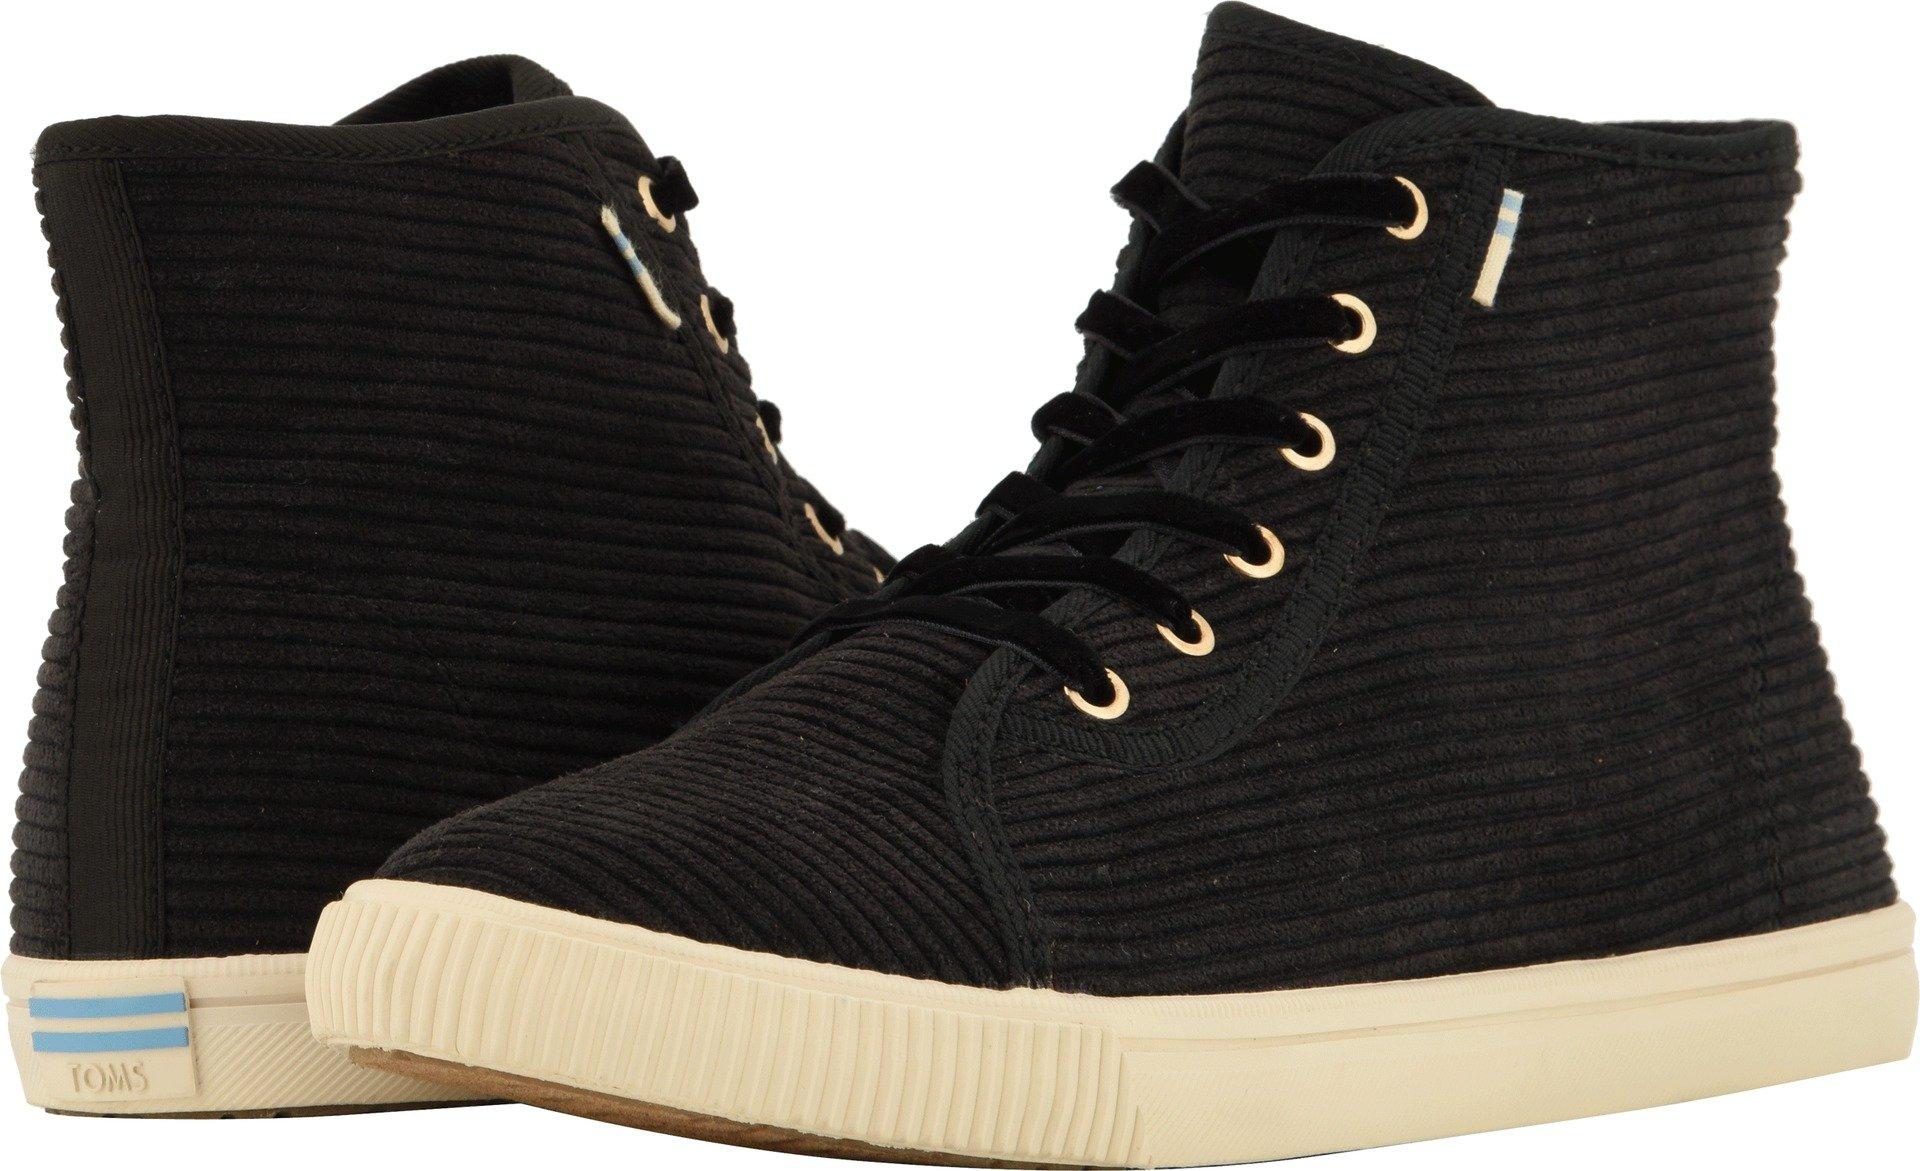 TOMS Women's Camarillo Polyester Sneaker, Size: 8.5 B(M) US, Color: Black Corduroy